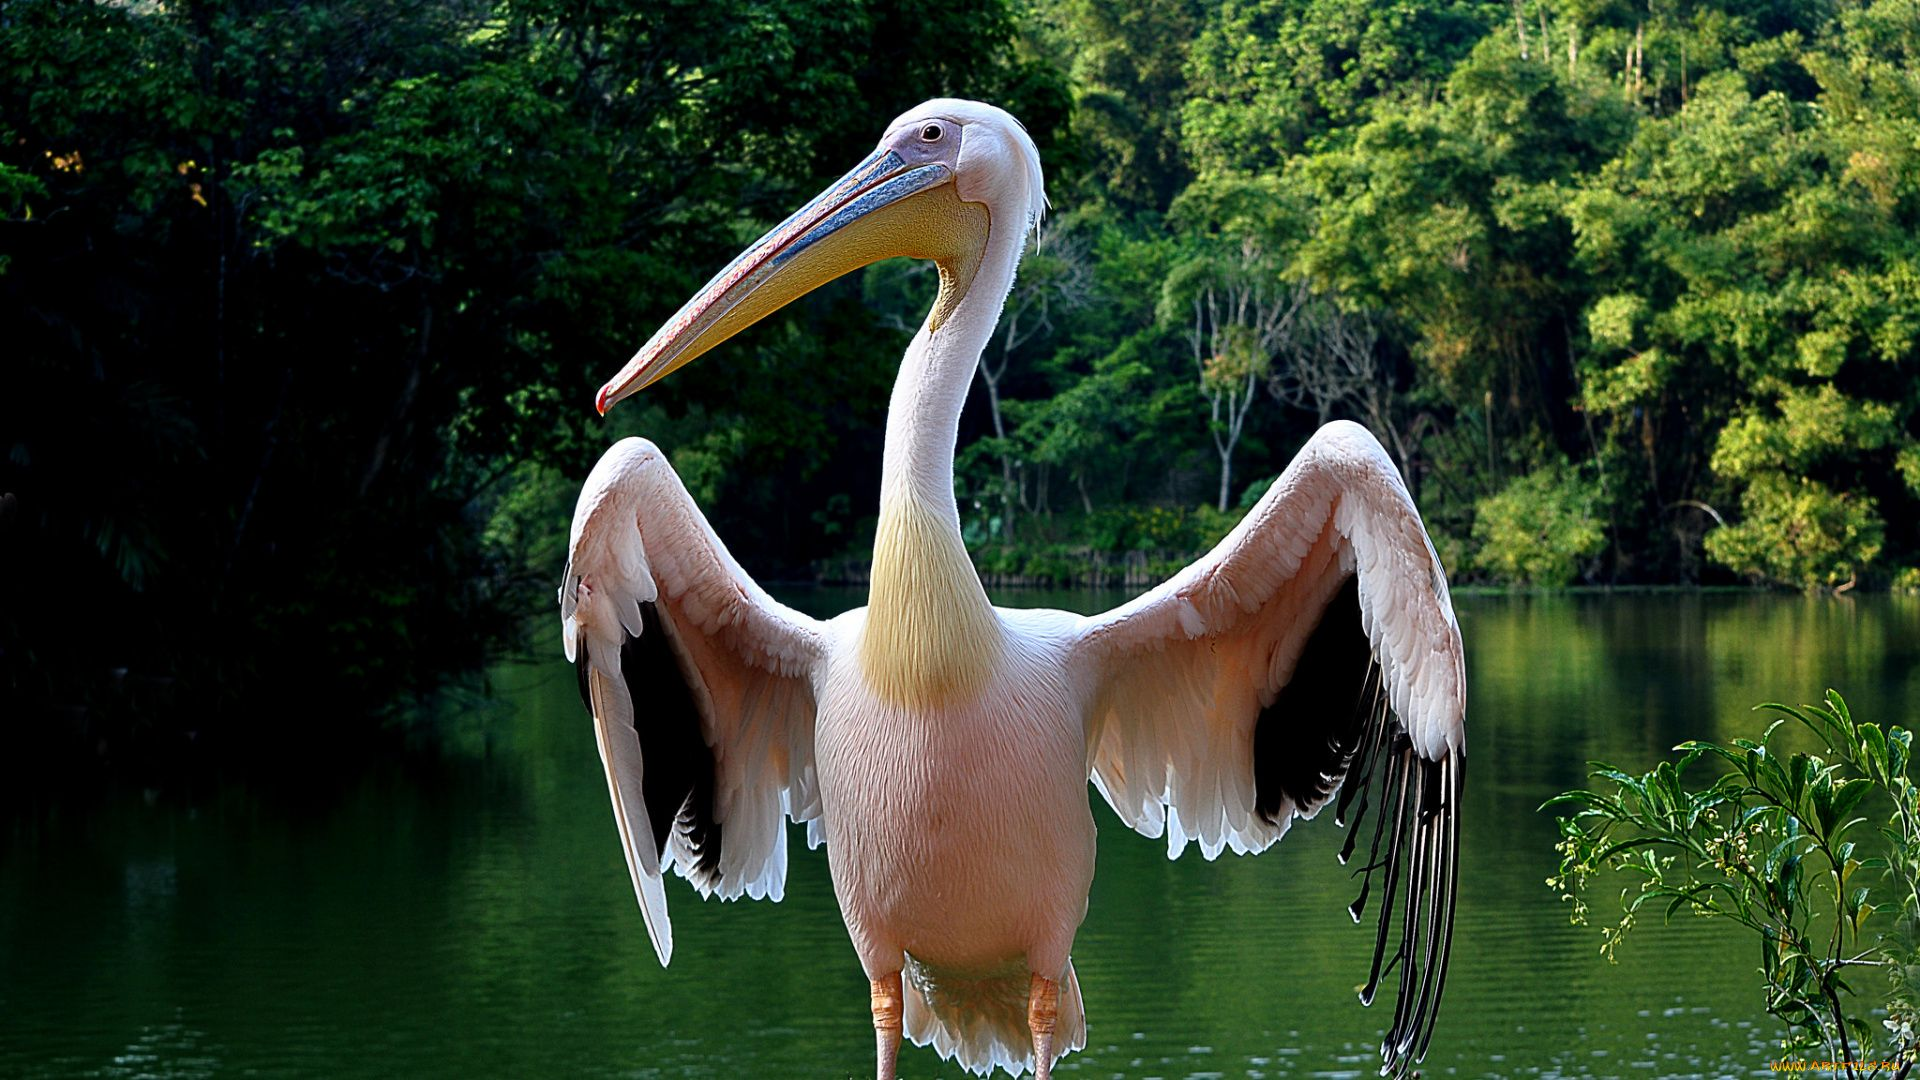 Pelican Cool HD Wallpaper